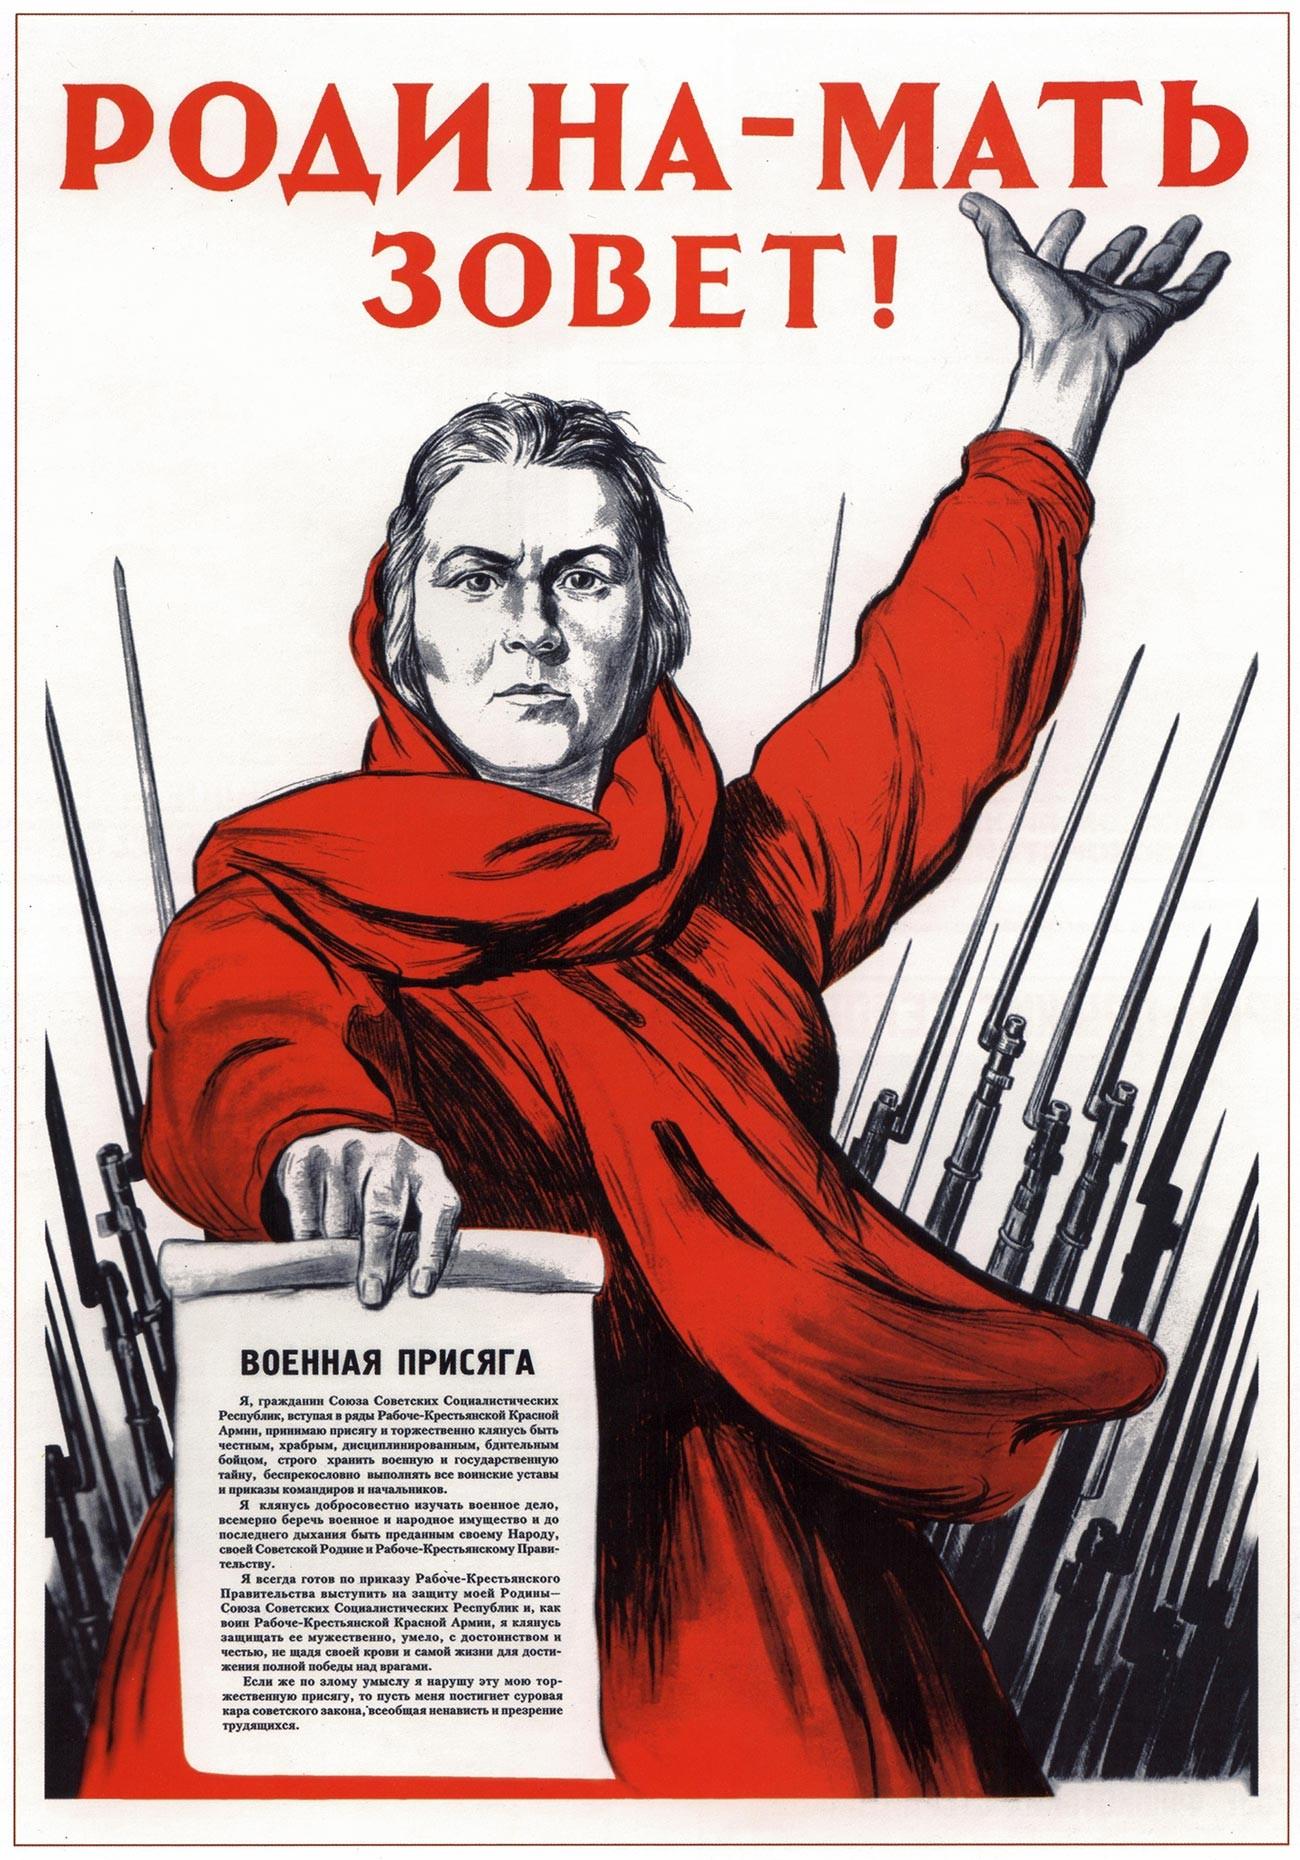 'The Motherland Calls' Soviet poster, 1941